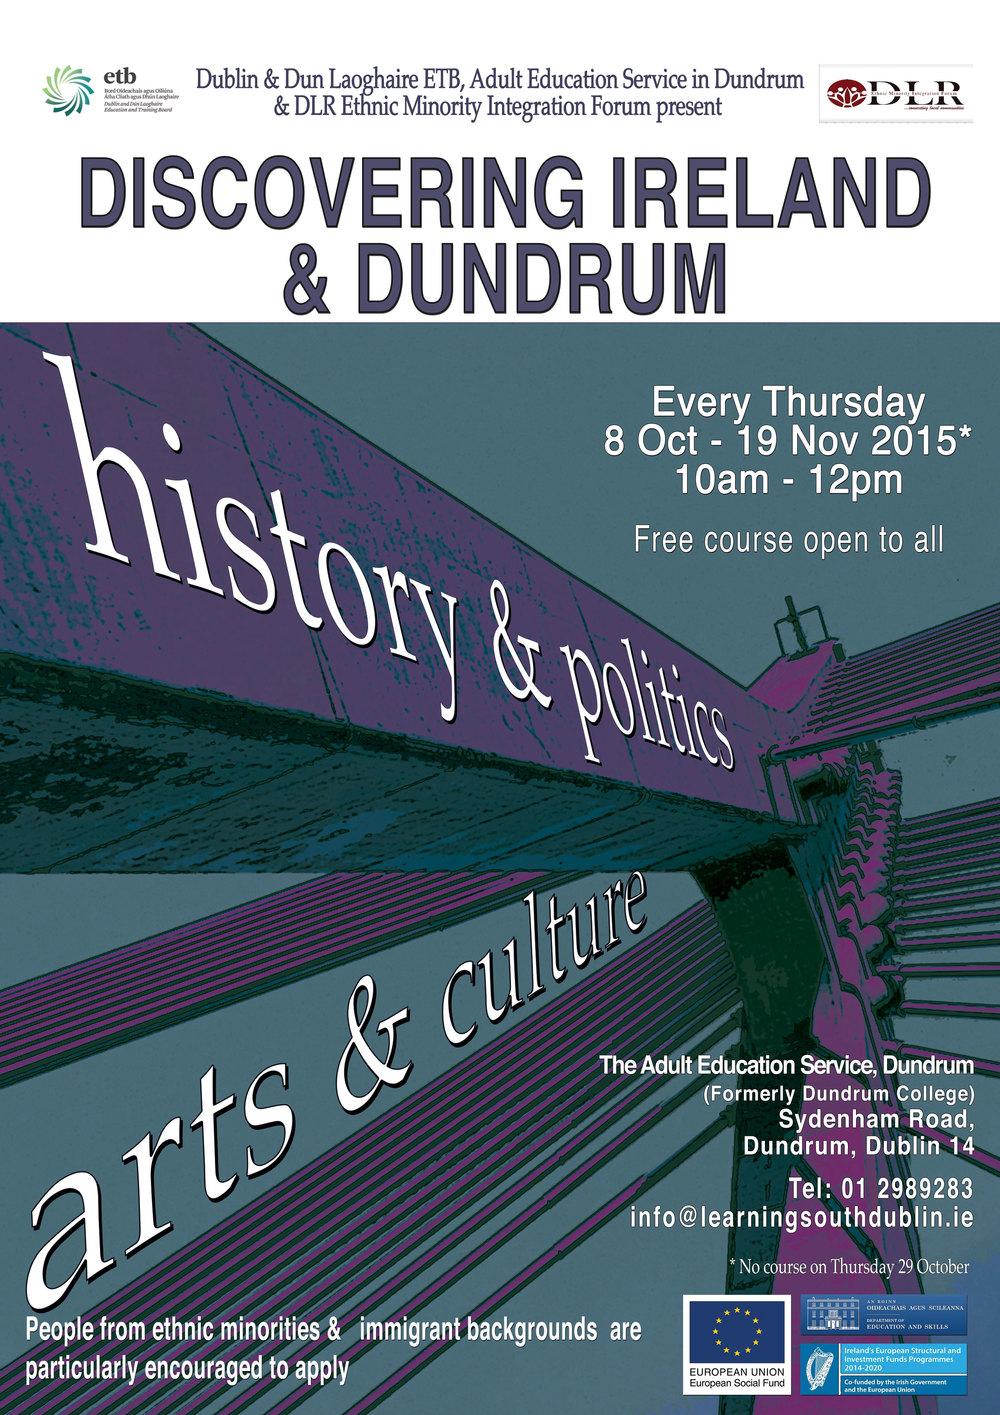 Dublin & Dun Laoghaire ETB